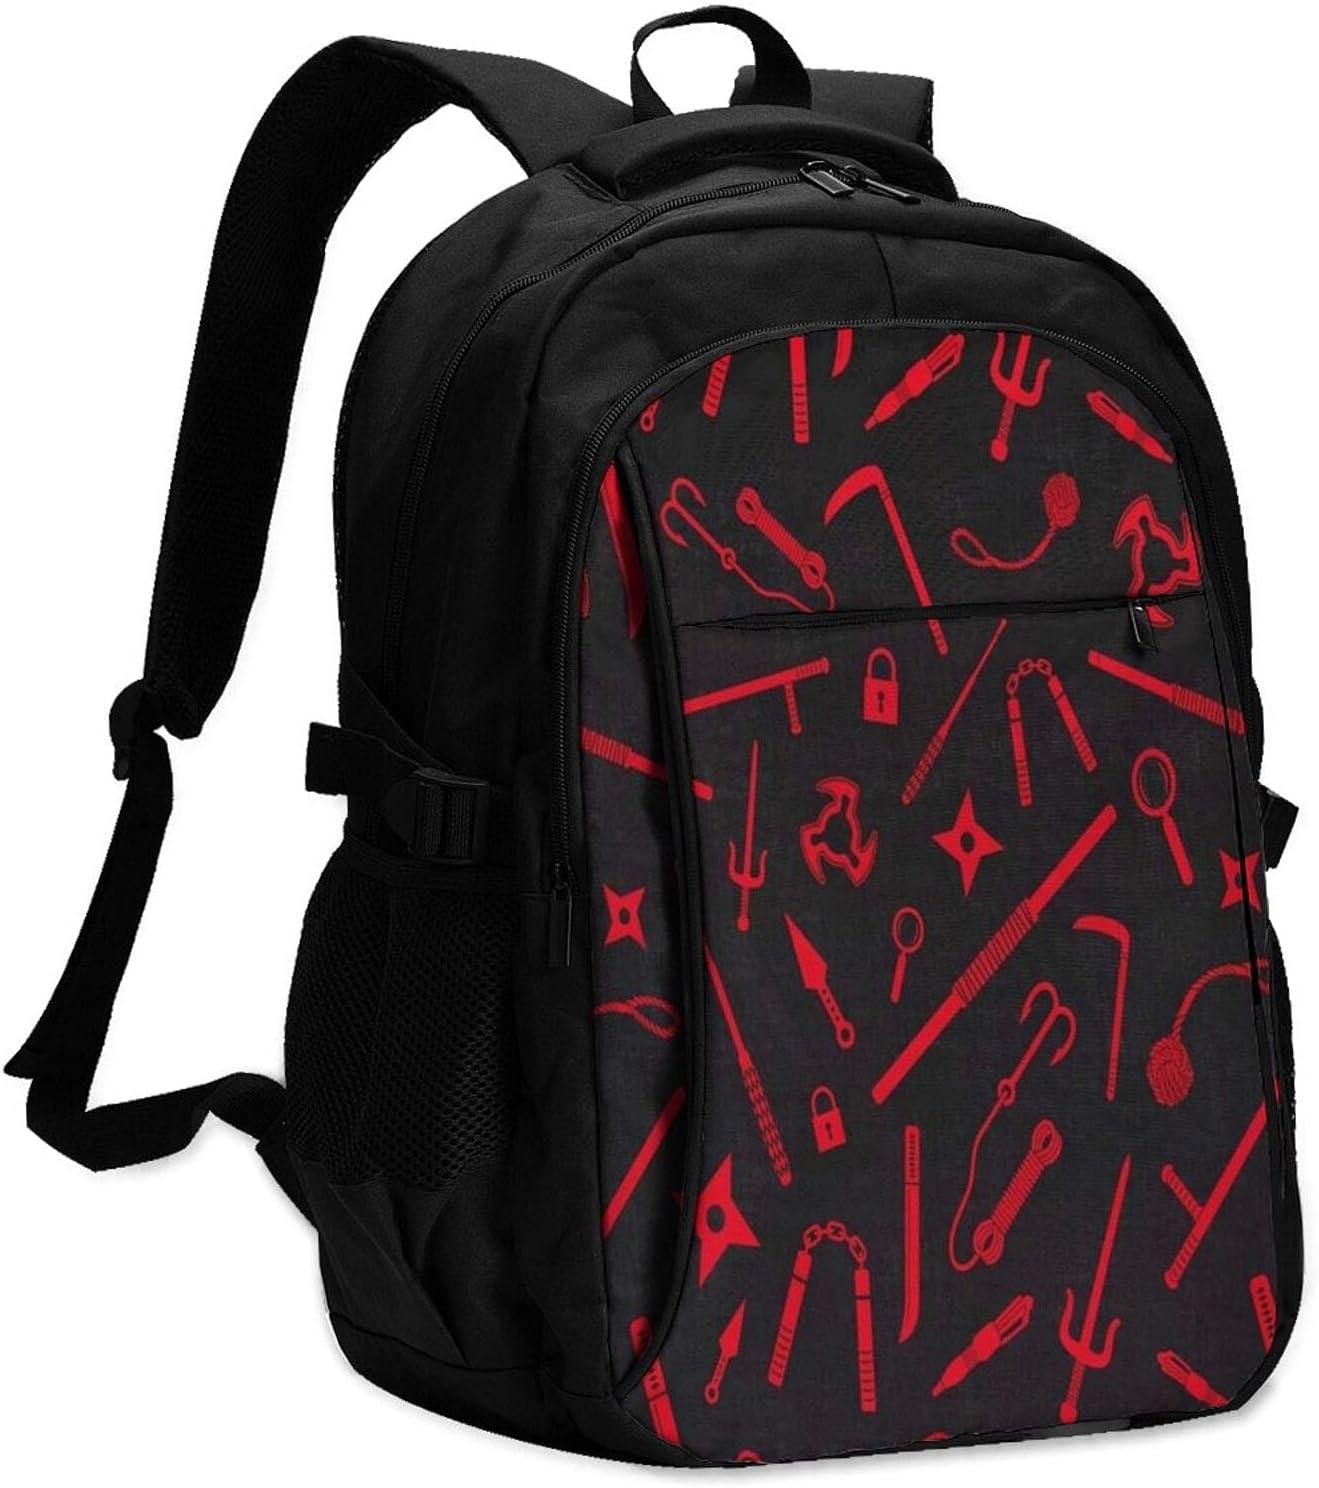 RJEWAONB Spy Ninjas Backpack With Usb Interface Backpack